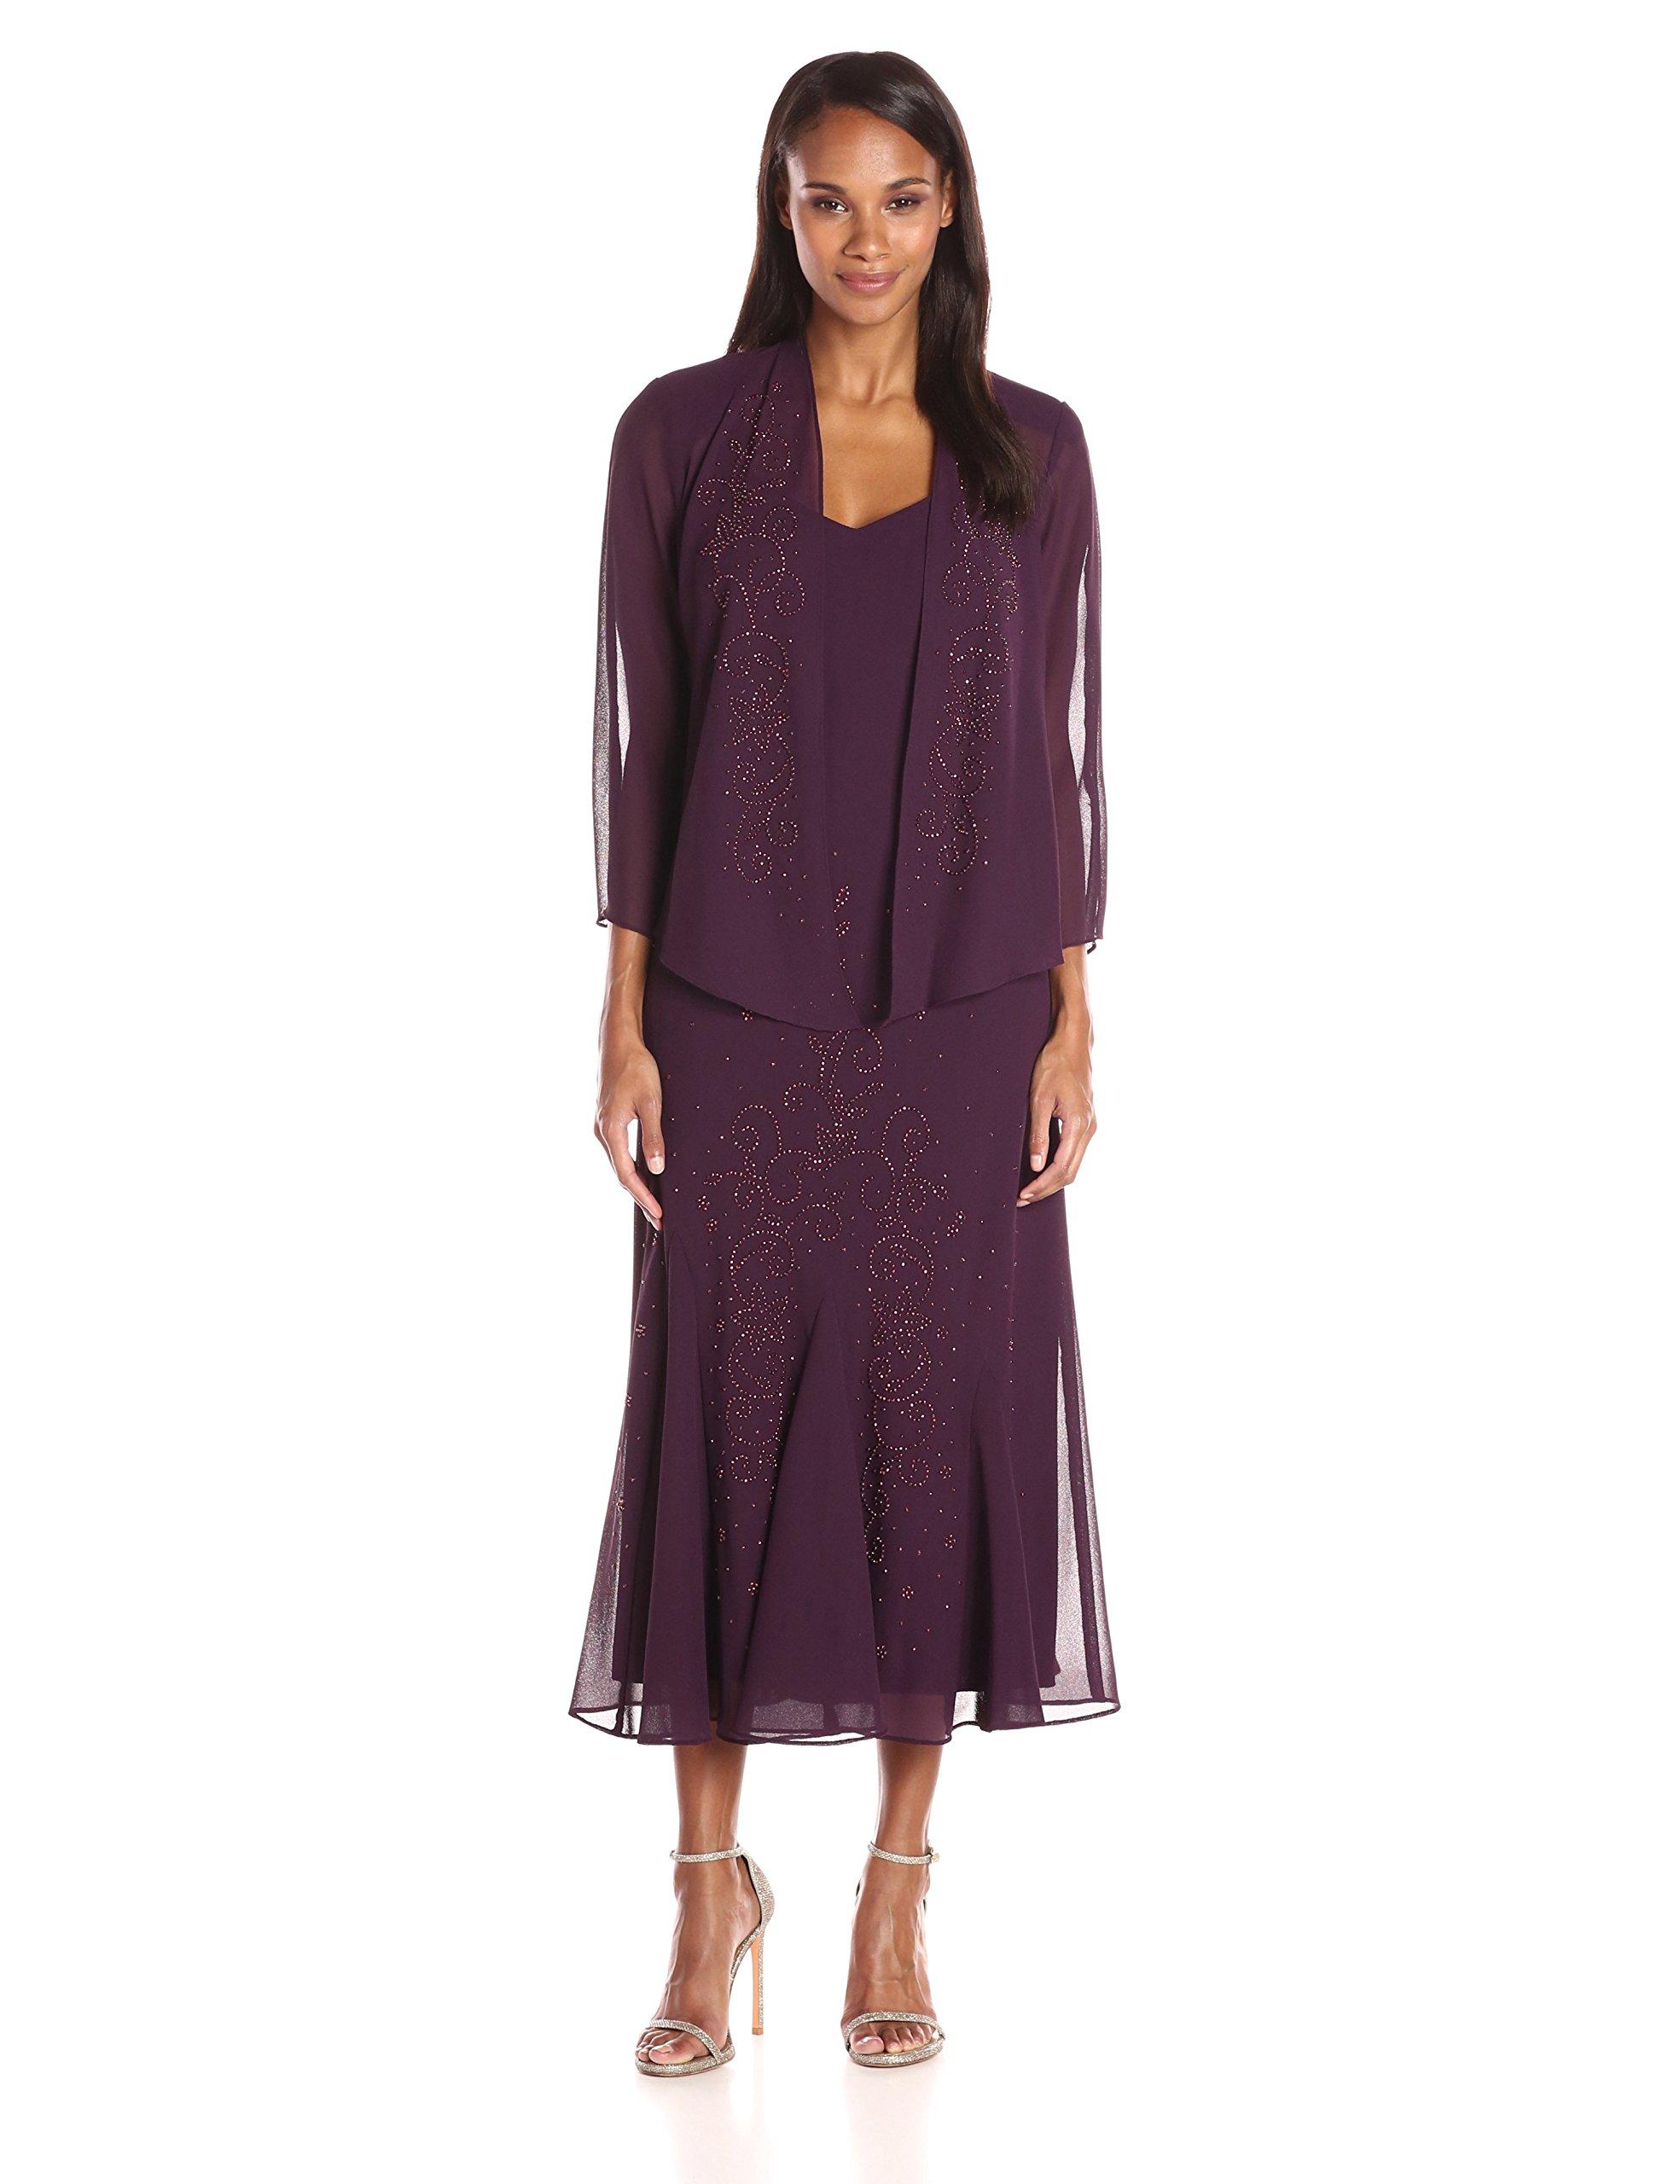 R&M Richards Women's Beaded Chiffon Jacket Dress, Eggplant, 14